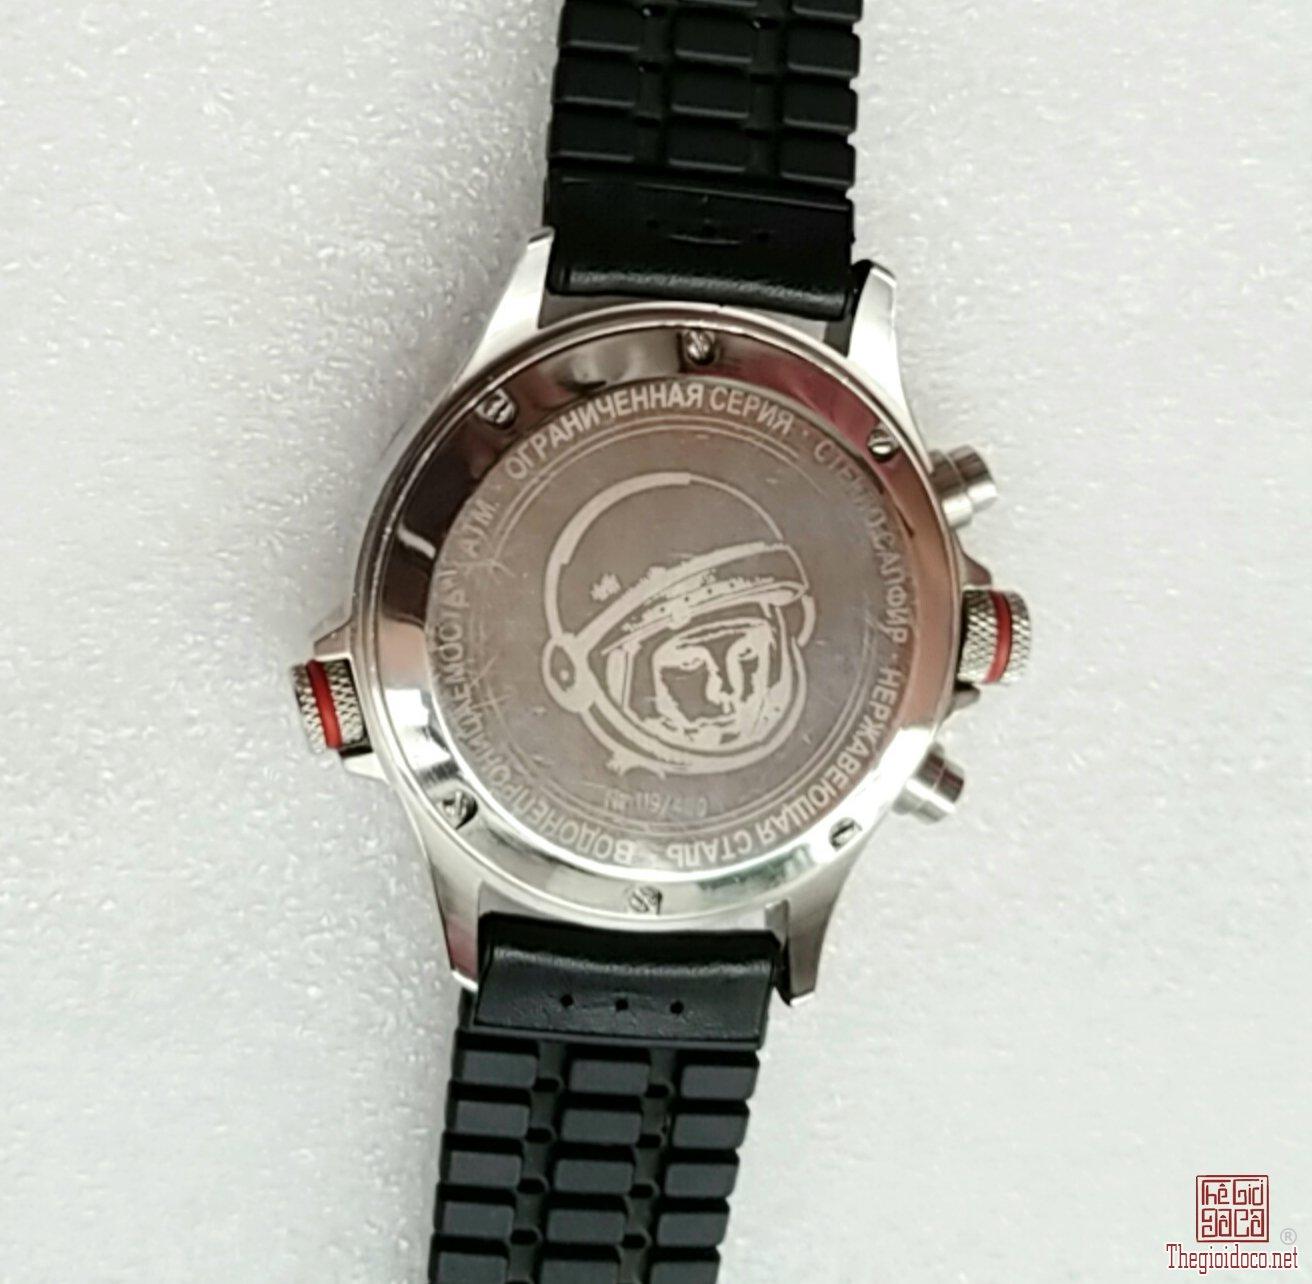 Đồng hồ lên dây POLJOT CHRONOGRAPH LIMITED